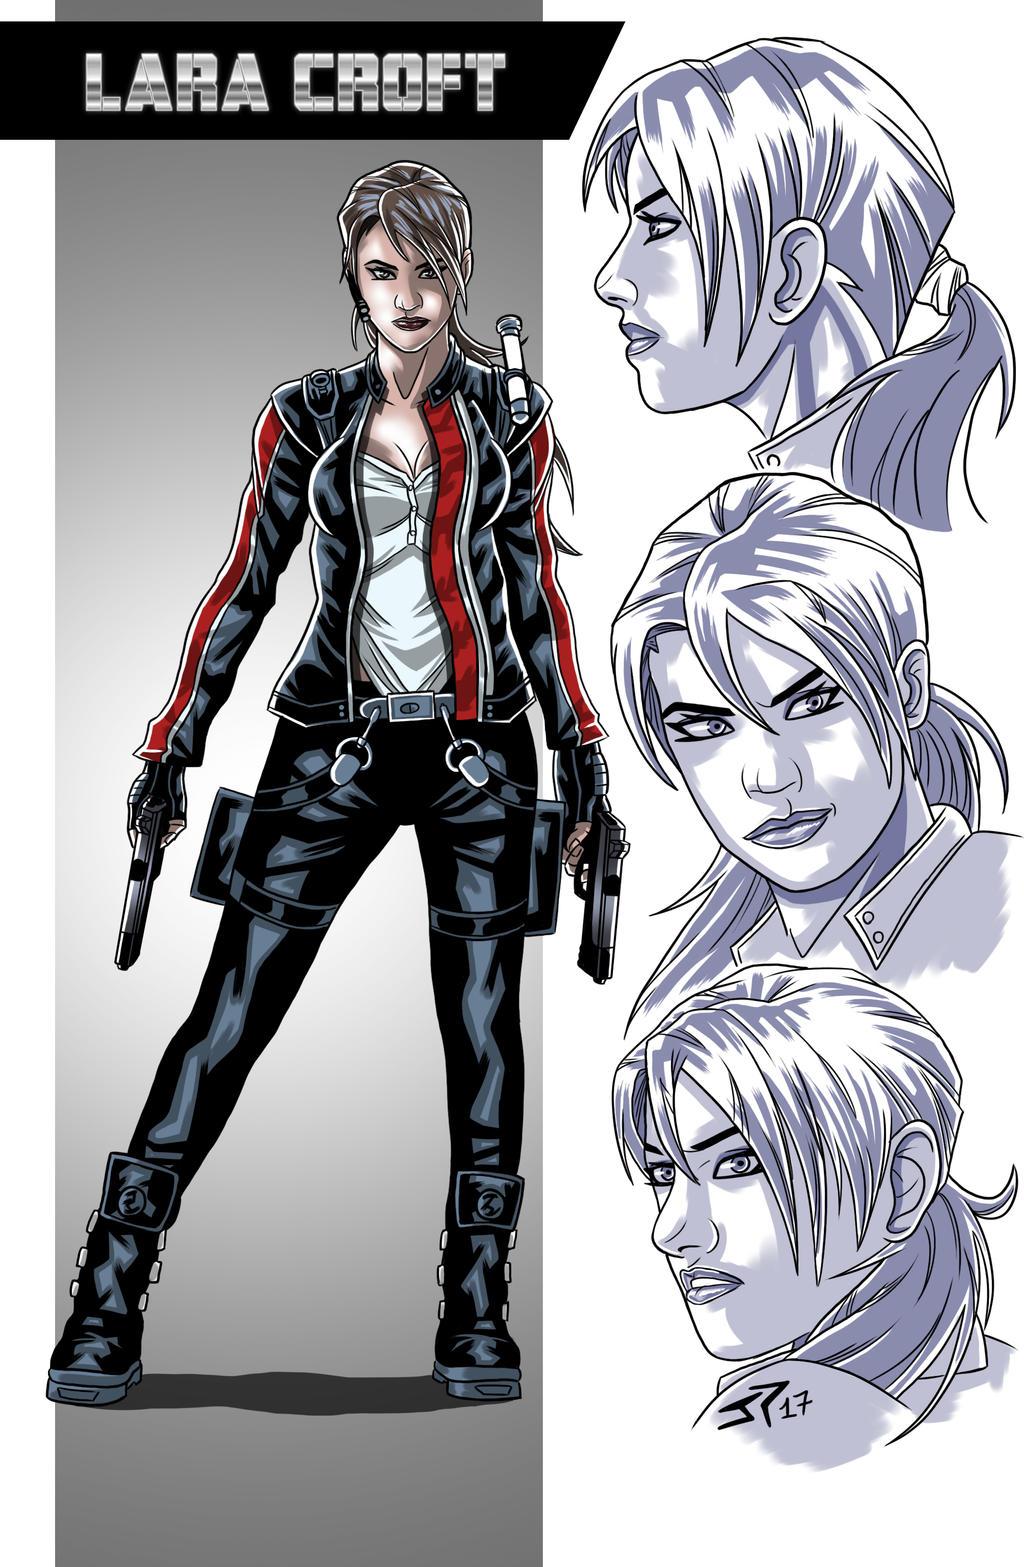 Lara Croft Character Studio By Jonathanpiccini Jp On Deviantart